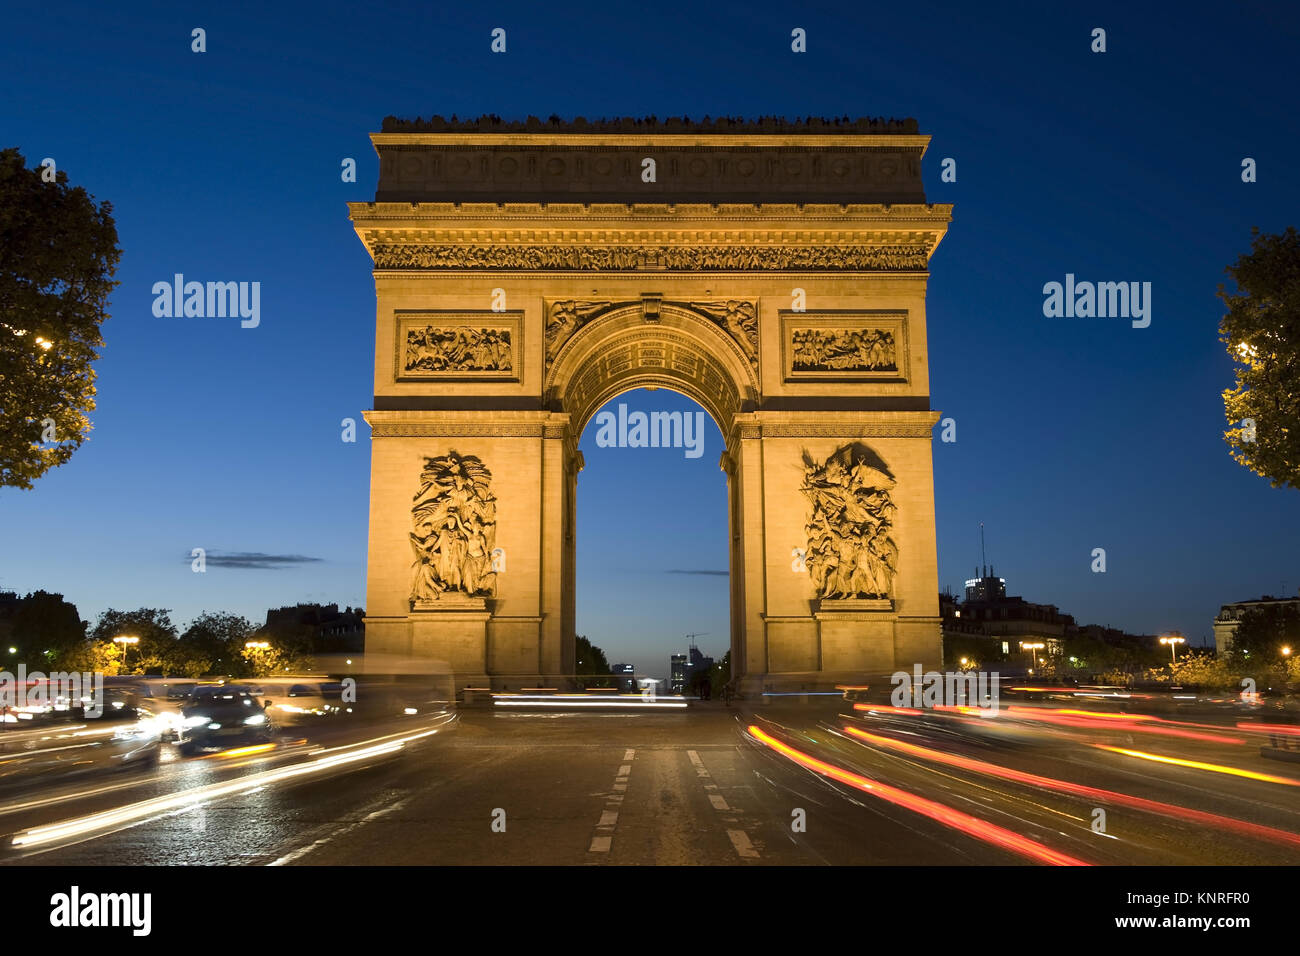 Beleuchteter Arc de Triomphe Bei Nacht, Paris, Frankreich Stockbild